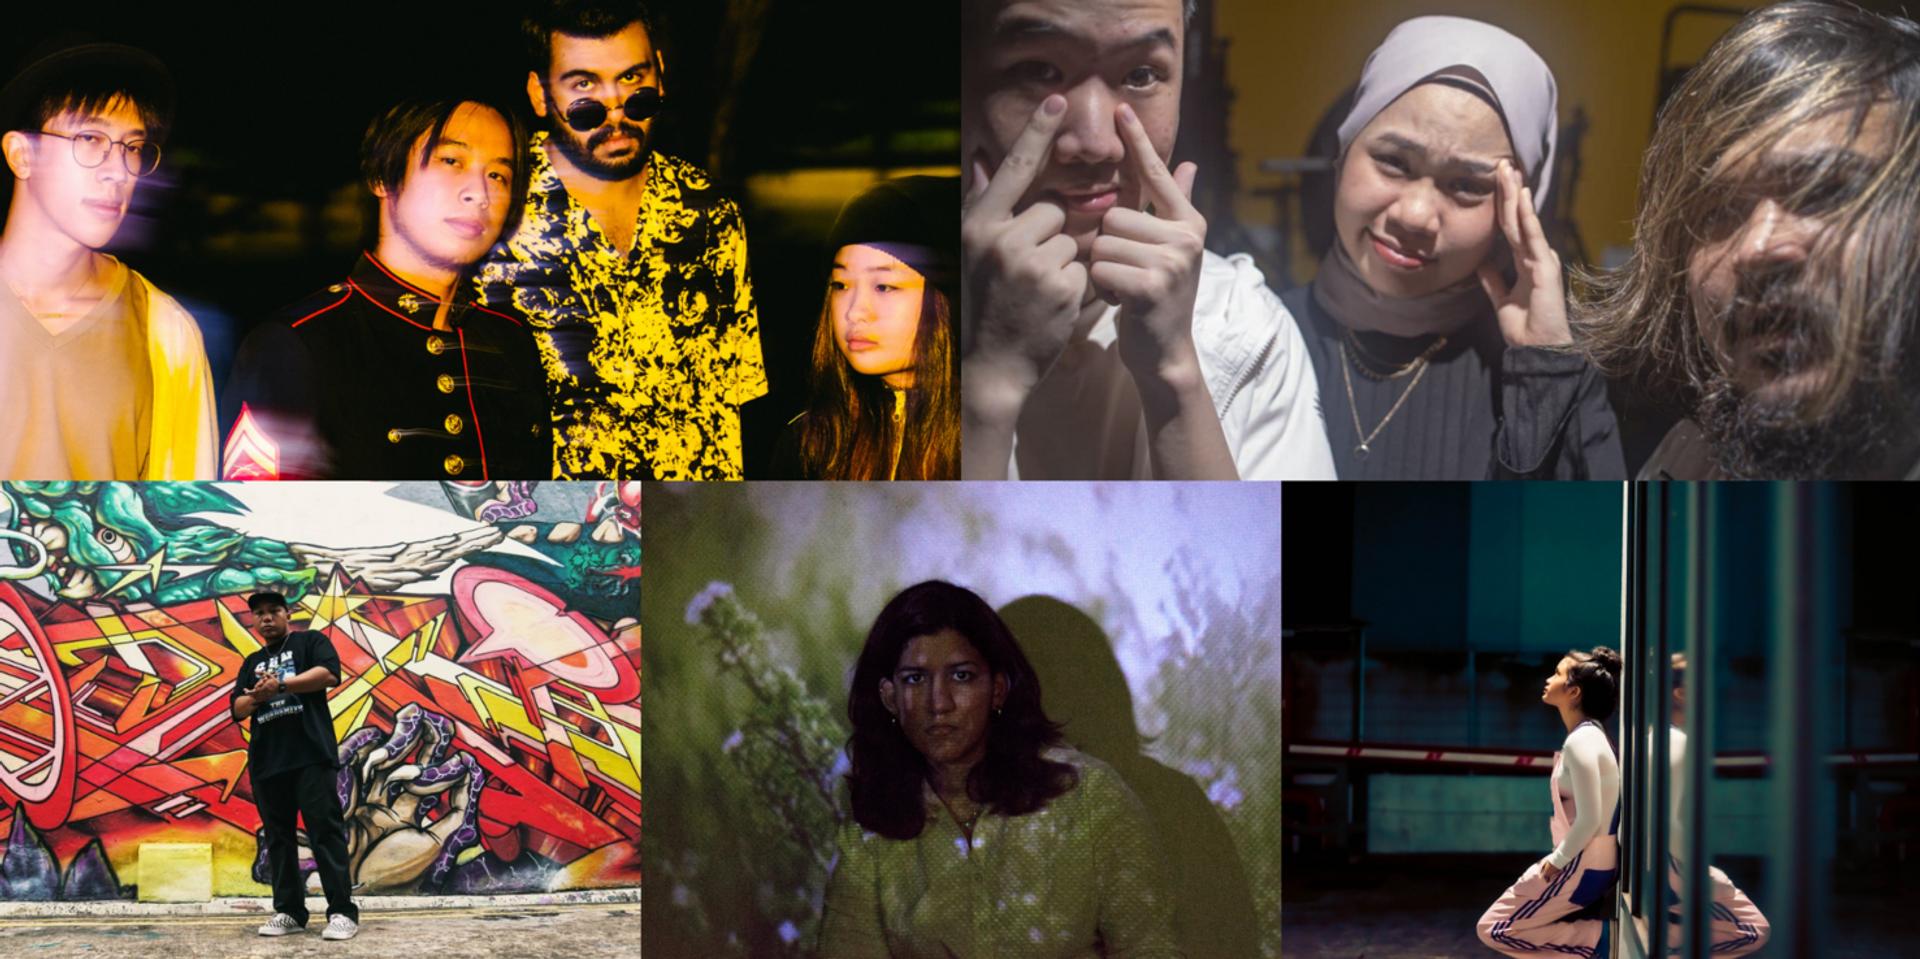 Vans Musicians Wanted 2021 Singapore Top 5 finalists announced: Cactus Cactus, Krysta Joy, San The Wordsmith, Sio Lubis, Yishun Panik